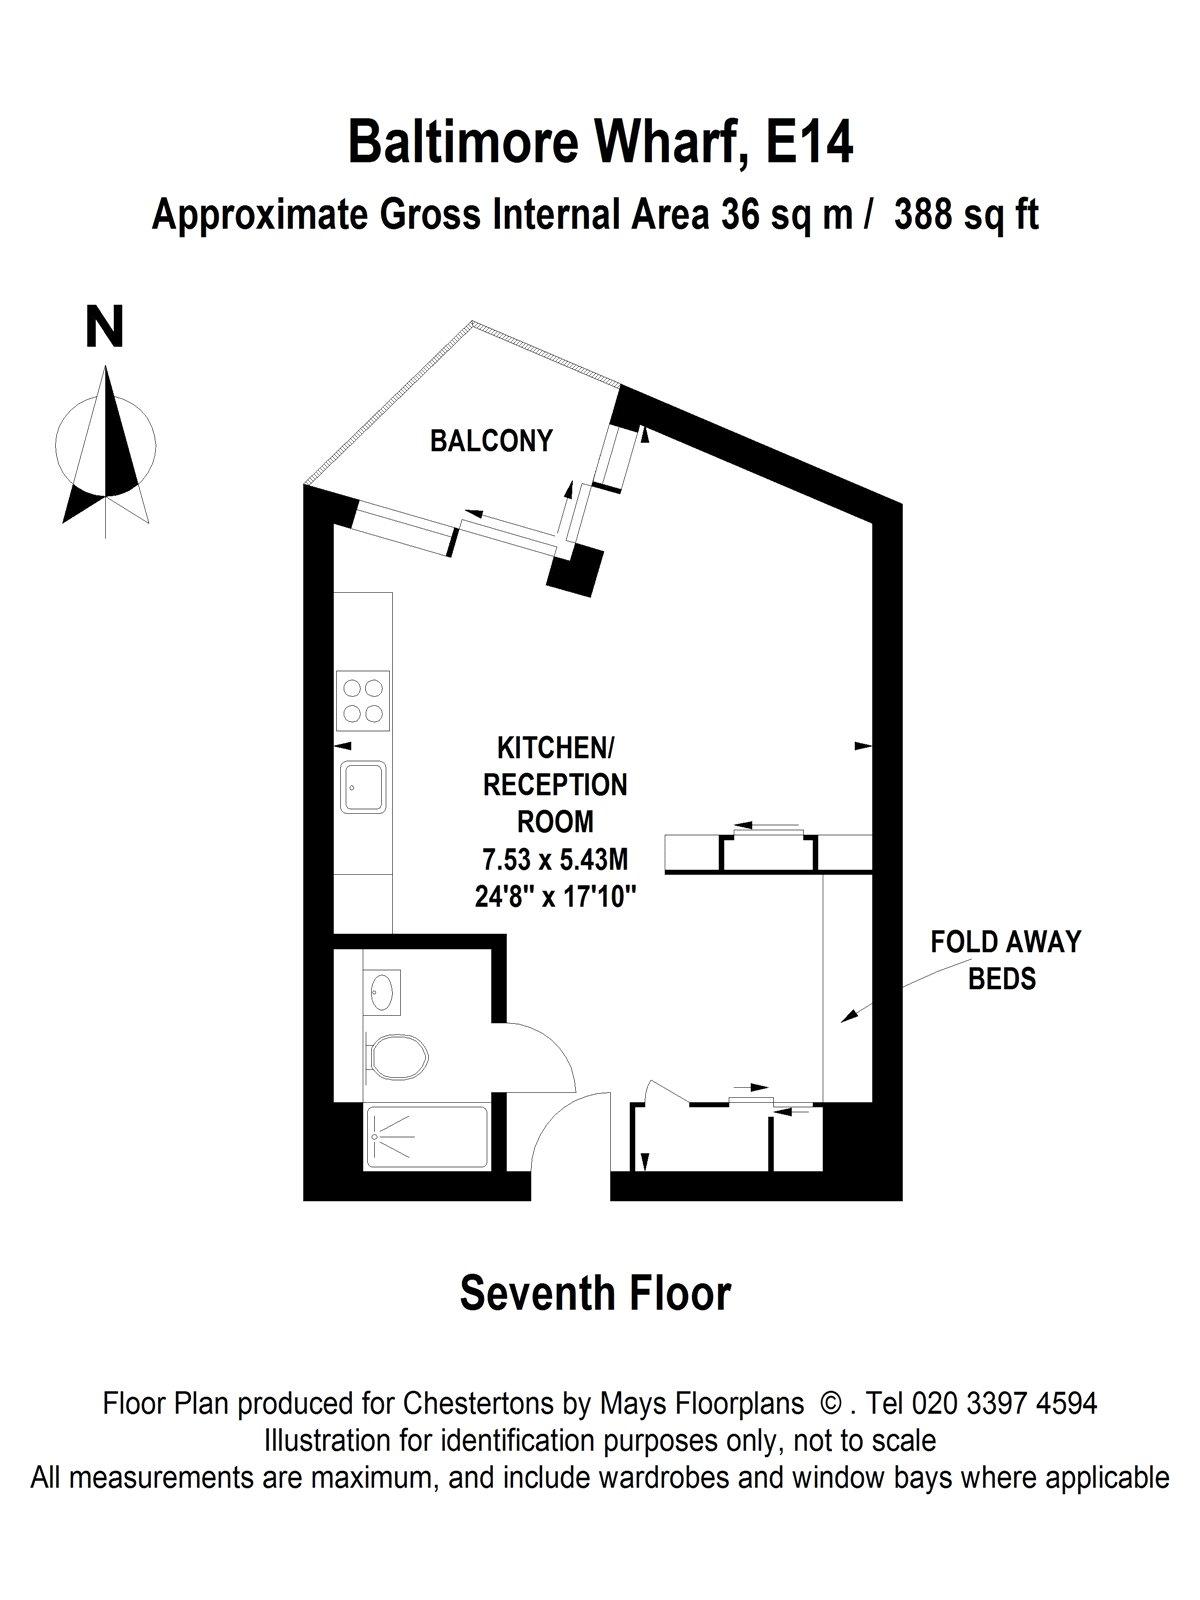 Studio to rent in Baltimore Wharf, London E14 - Zoopla